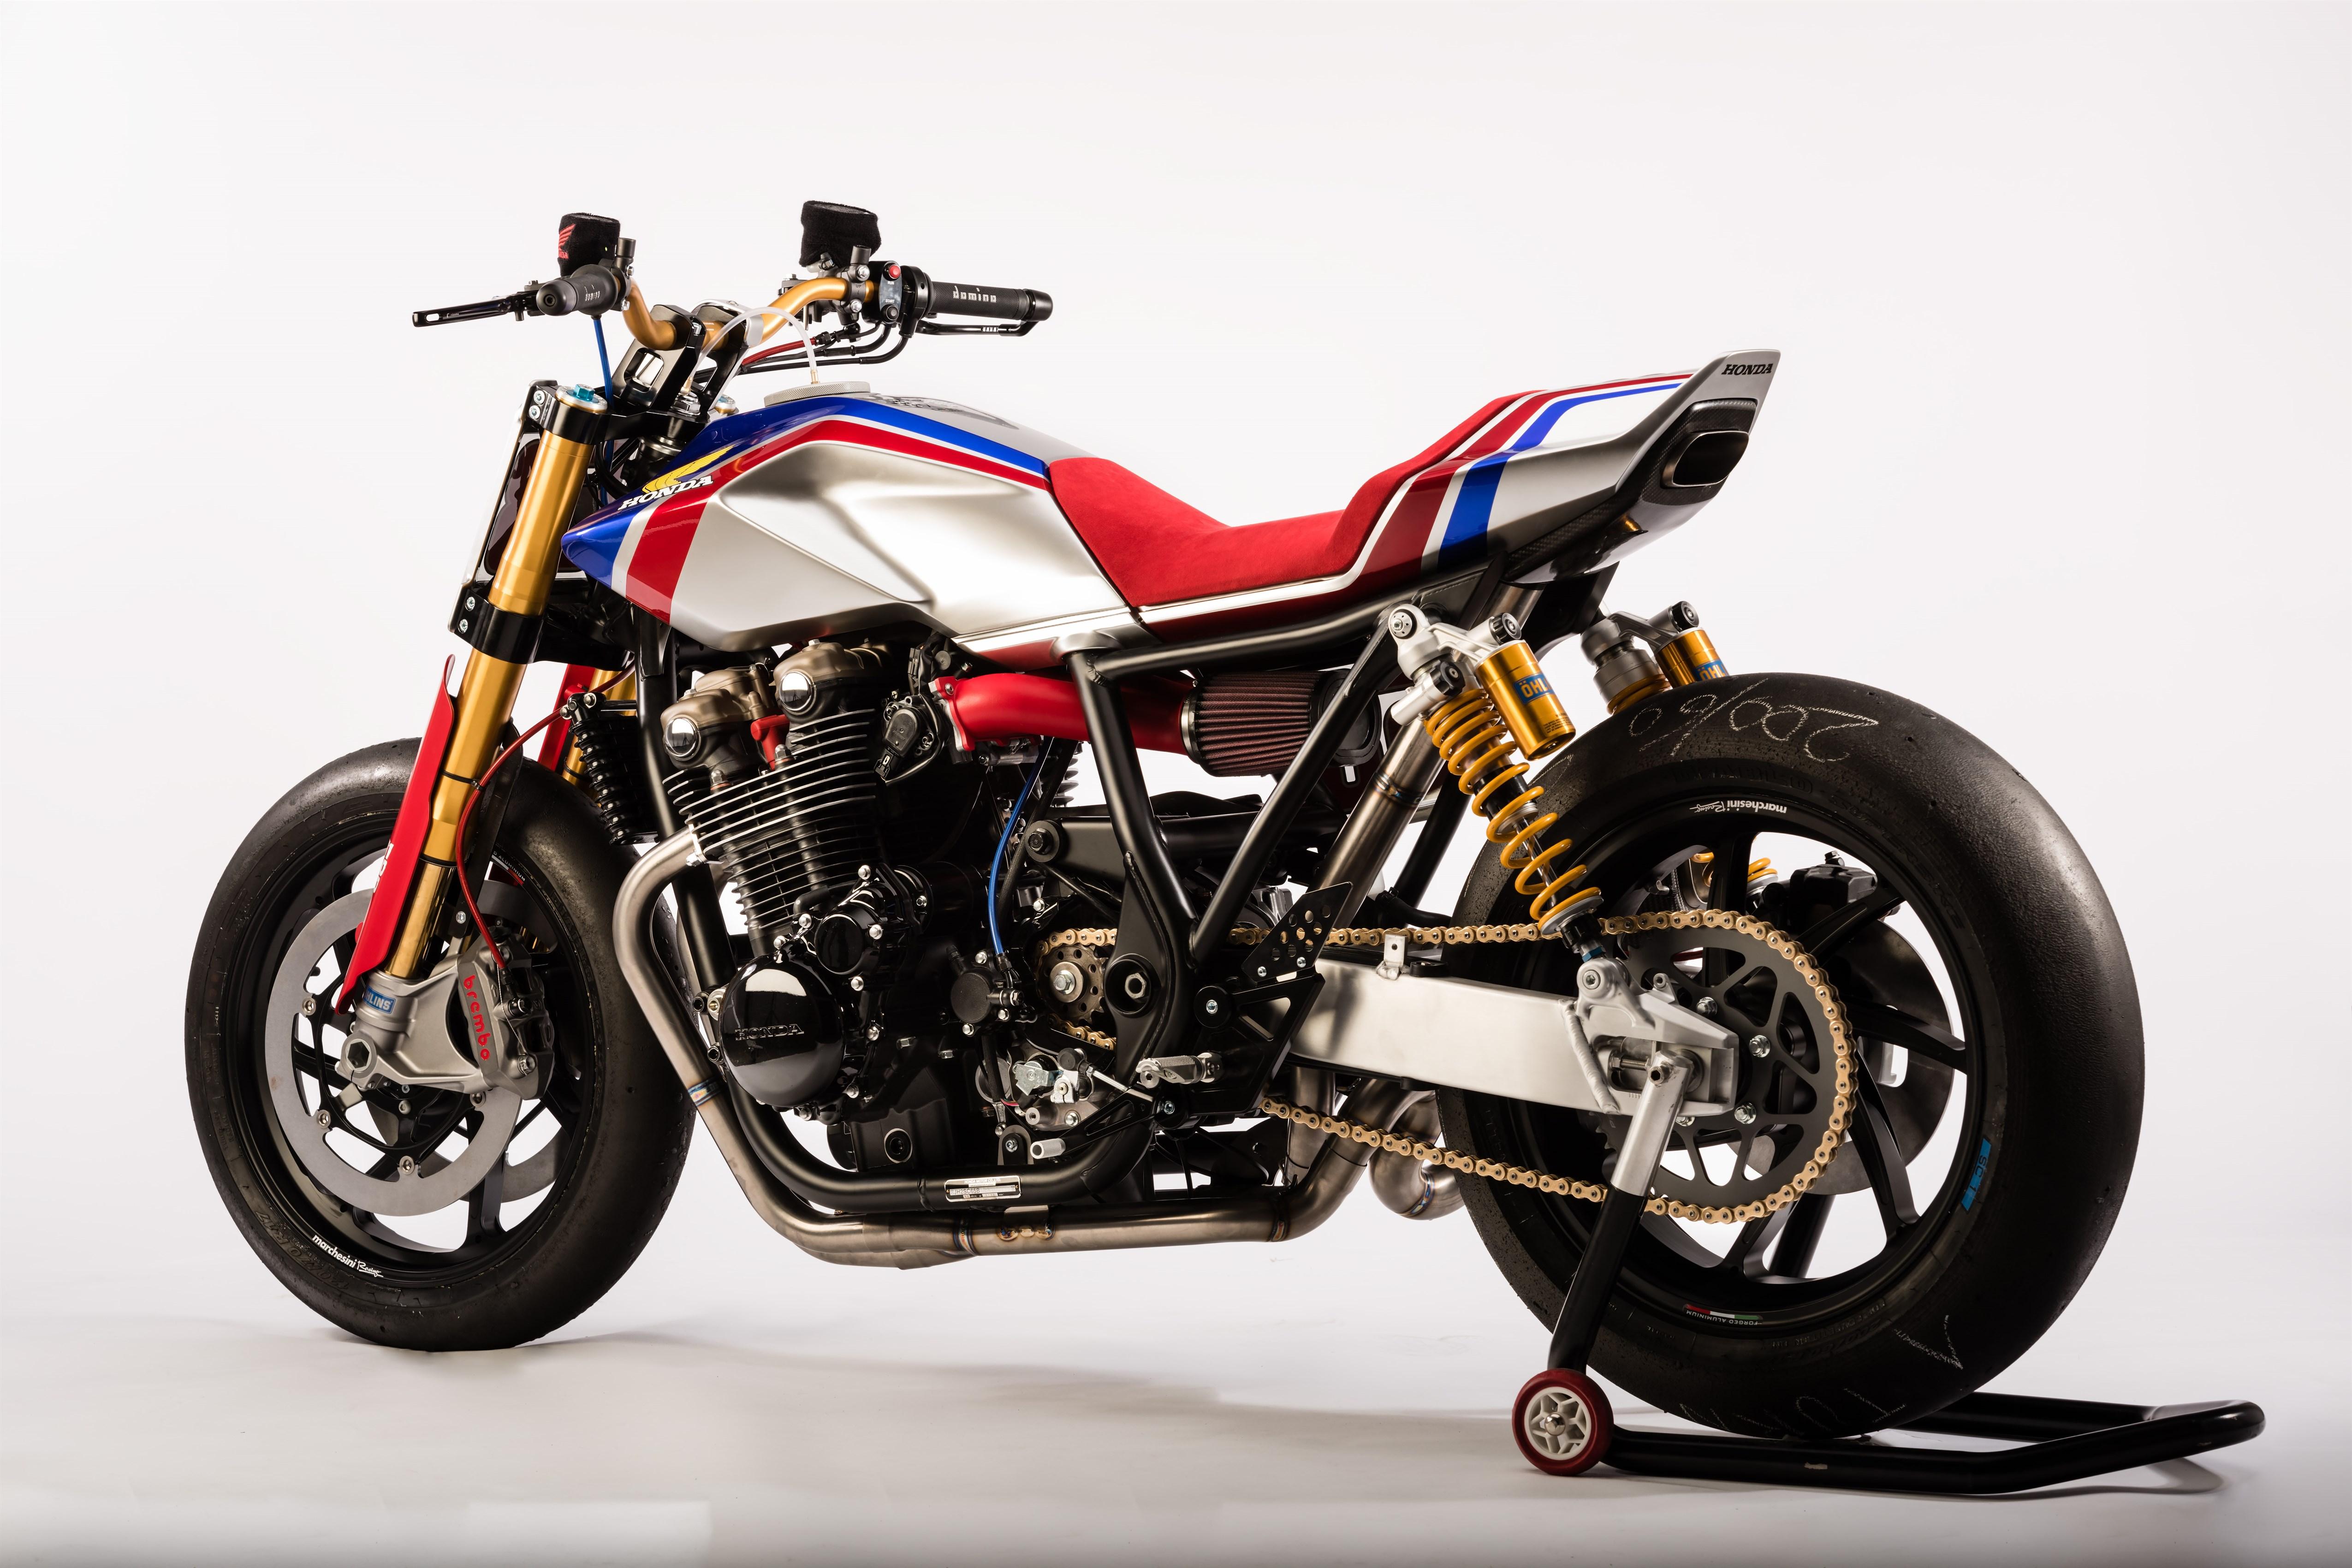 Neumotorrad: Honda CB1100 RS, Baujahr: 2020, 14.500,00 EUR